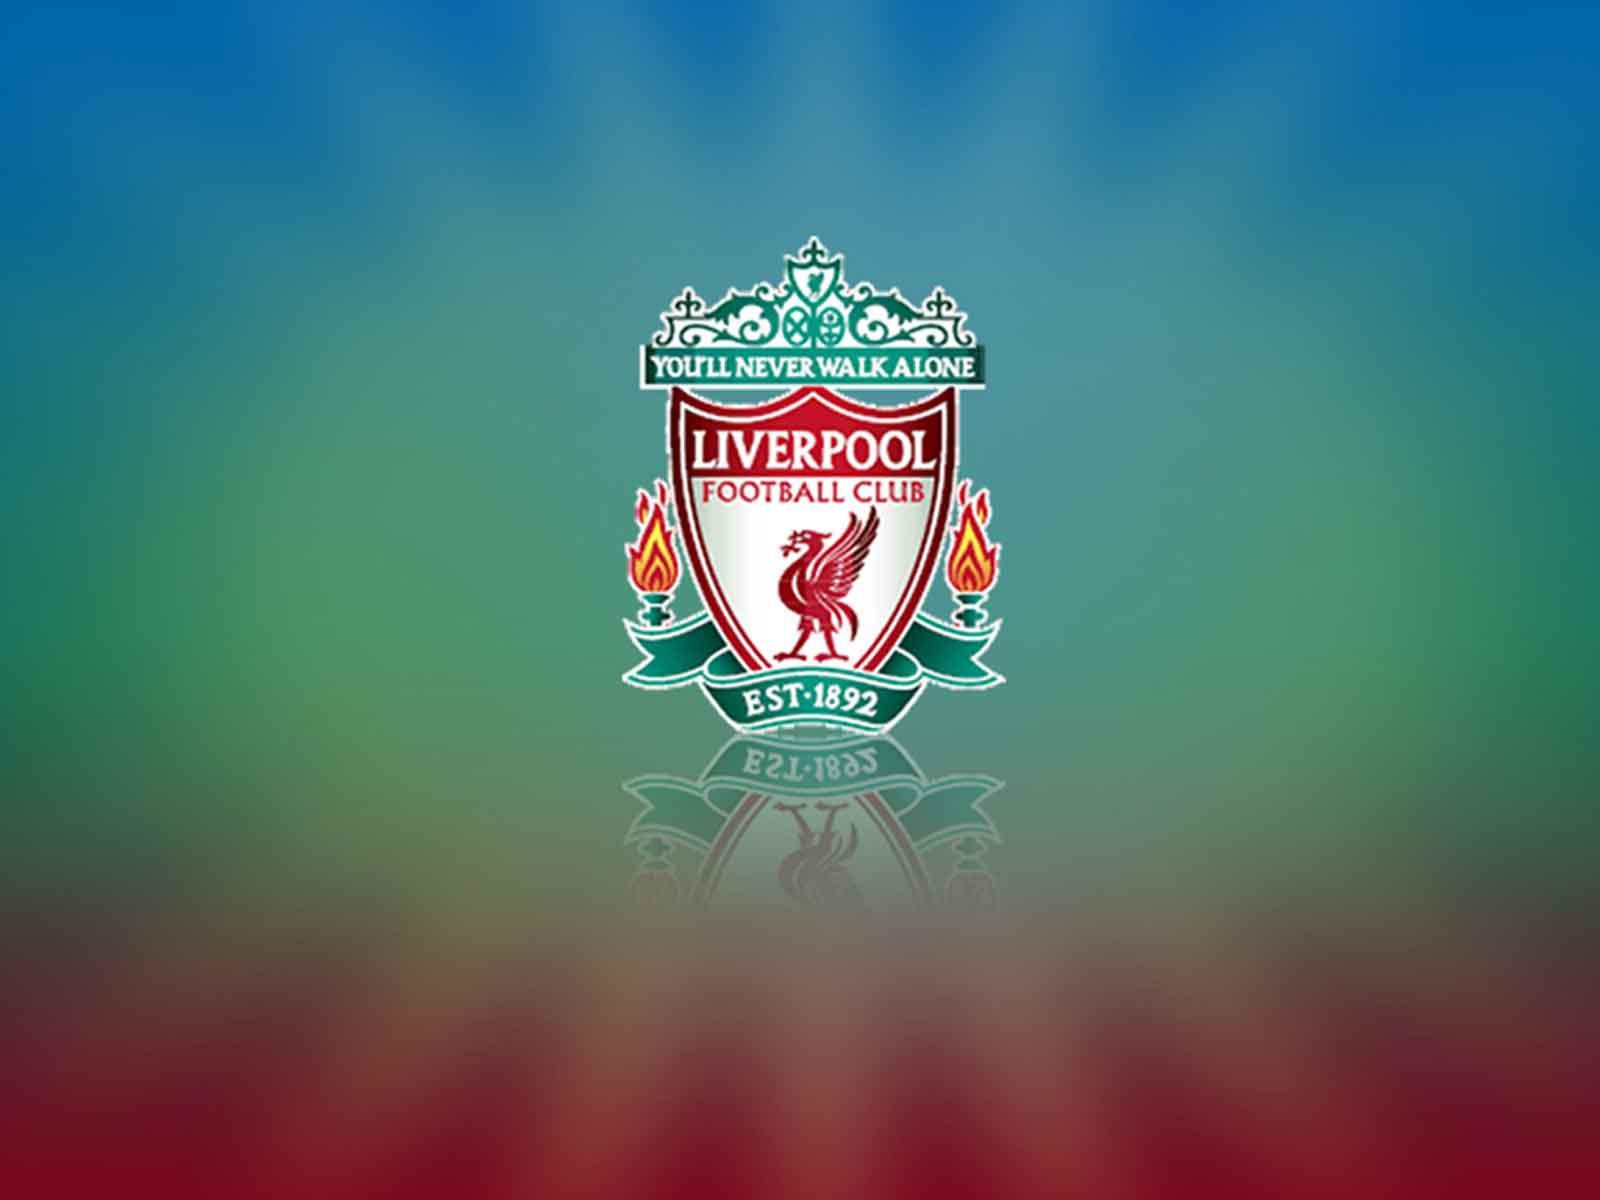 Liverpool FC Logo HD Wallpapers 2012 1600x1200